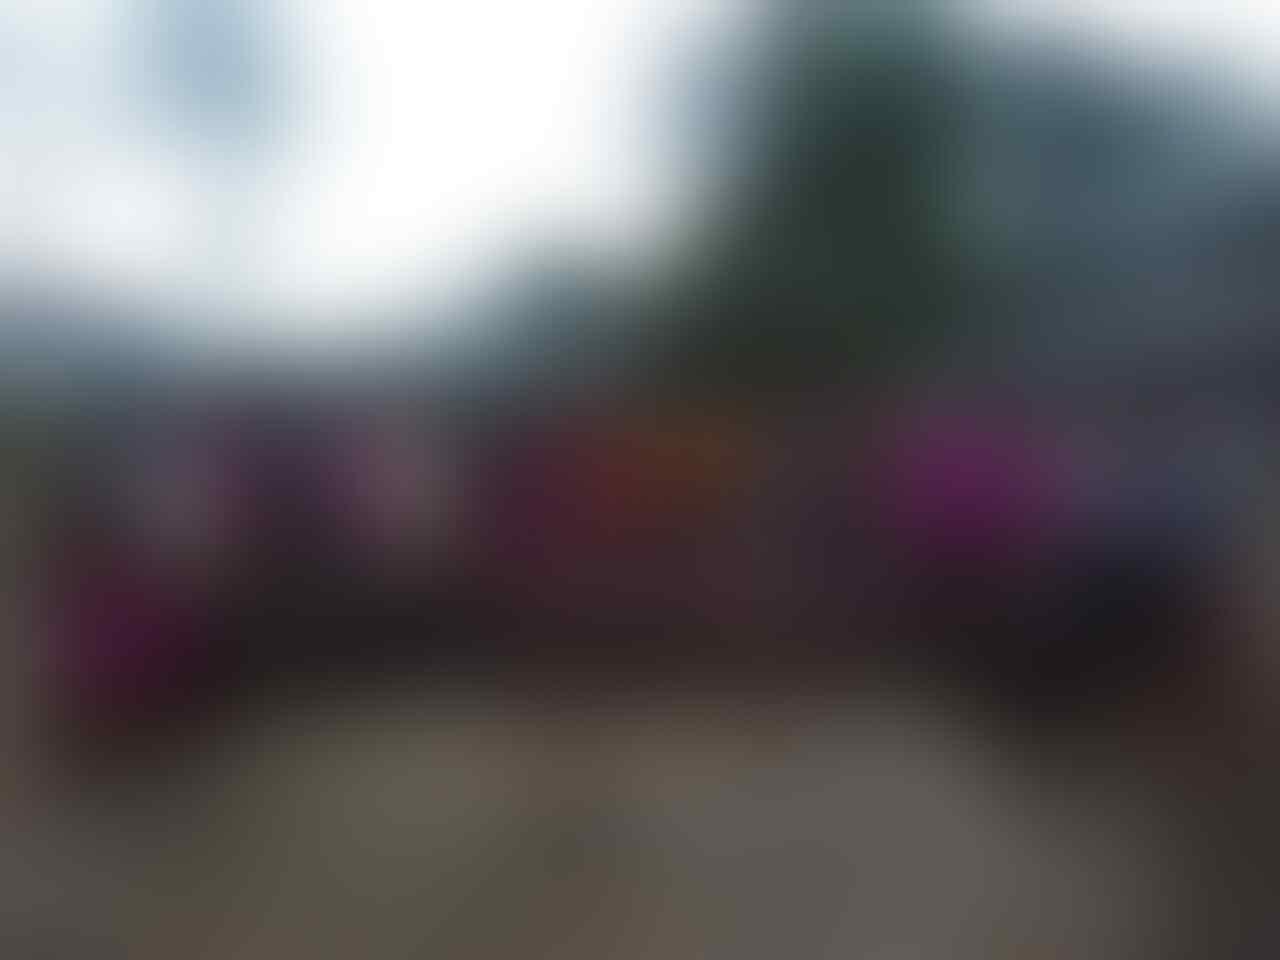 [KASKUS AWARDS 2018] Nominasi Kopdar Terheboh